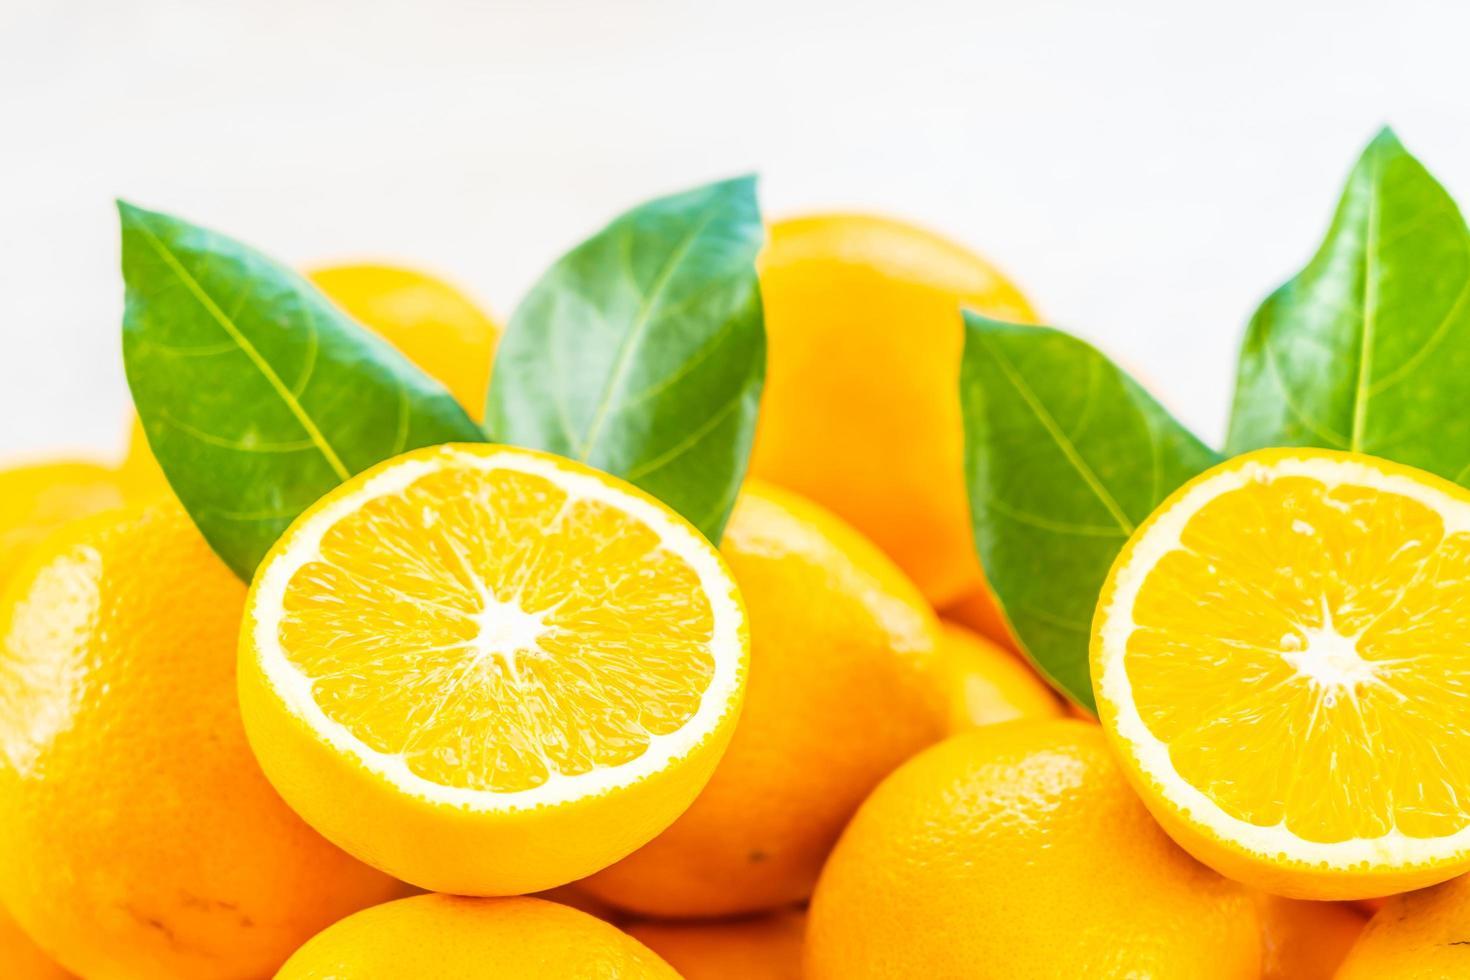 laranjas frescas, close-up foto